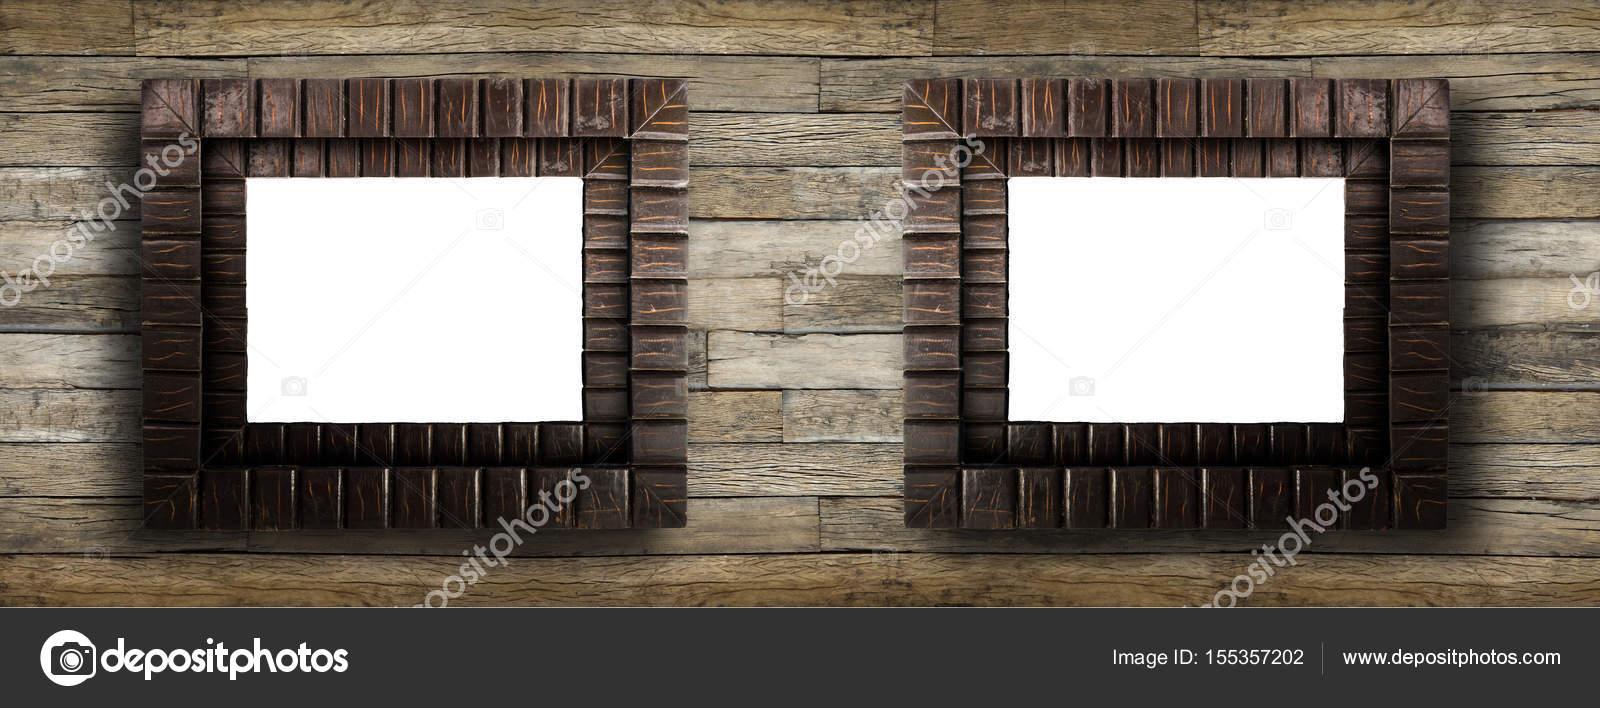 Grunge rustikale Holz Bilderrahmen — Stockfoto © thawornnulove ...